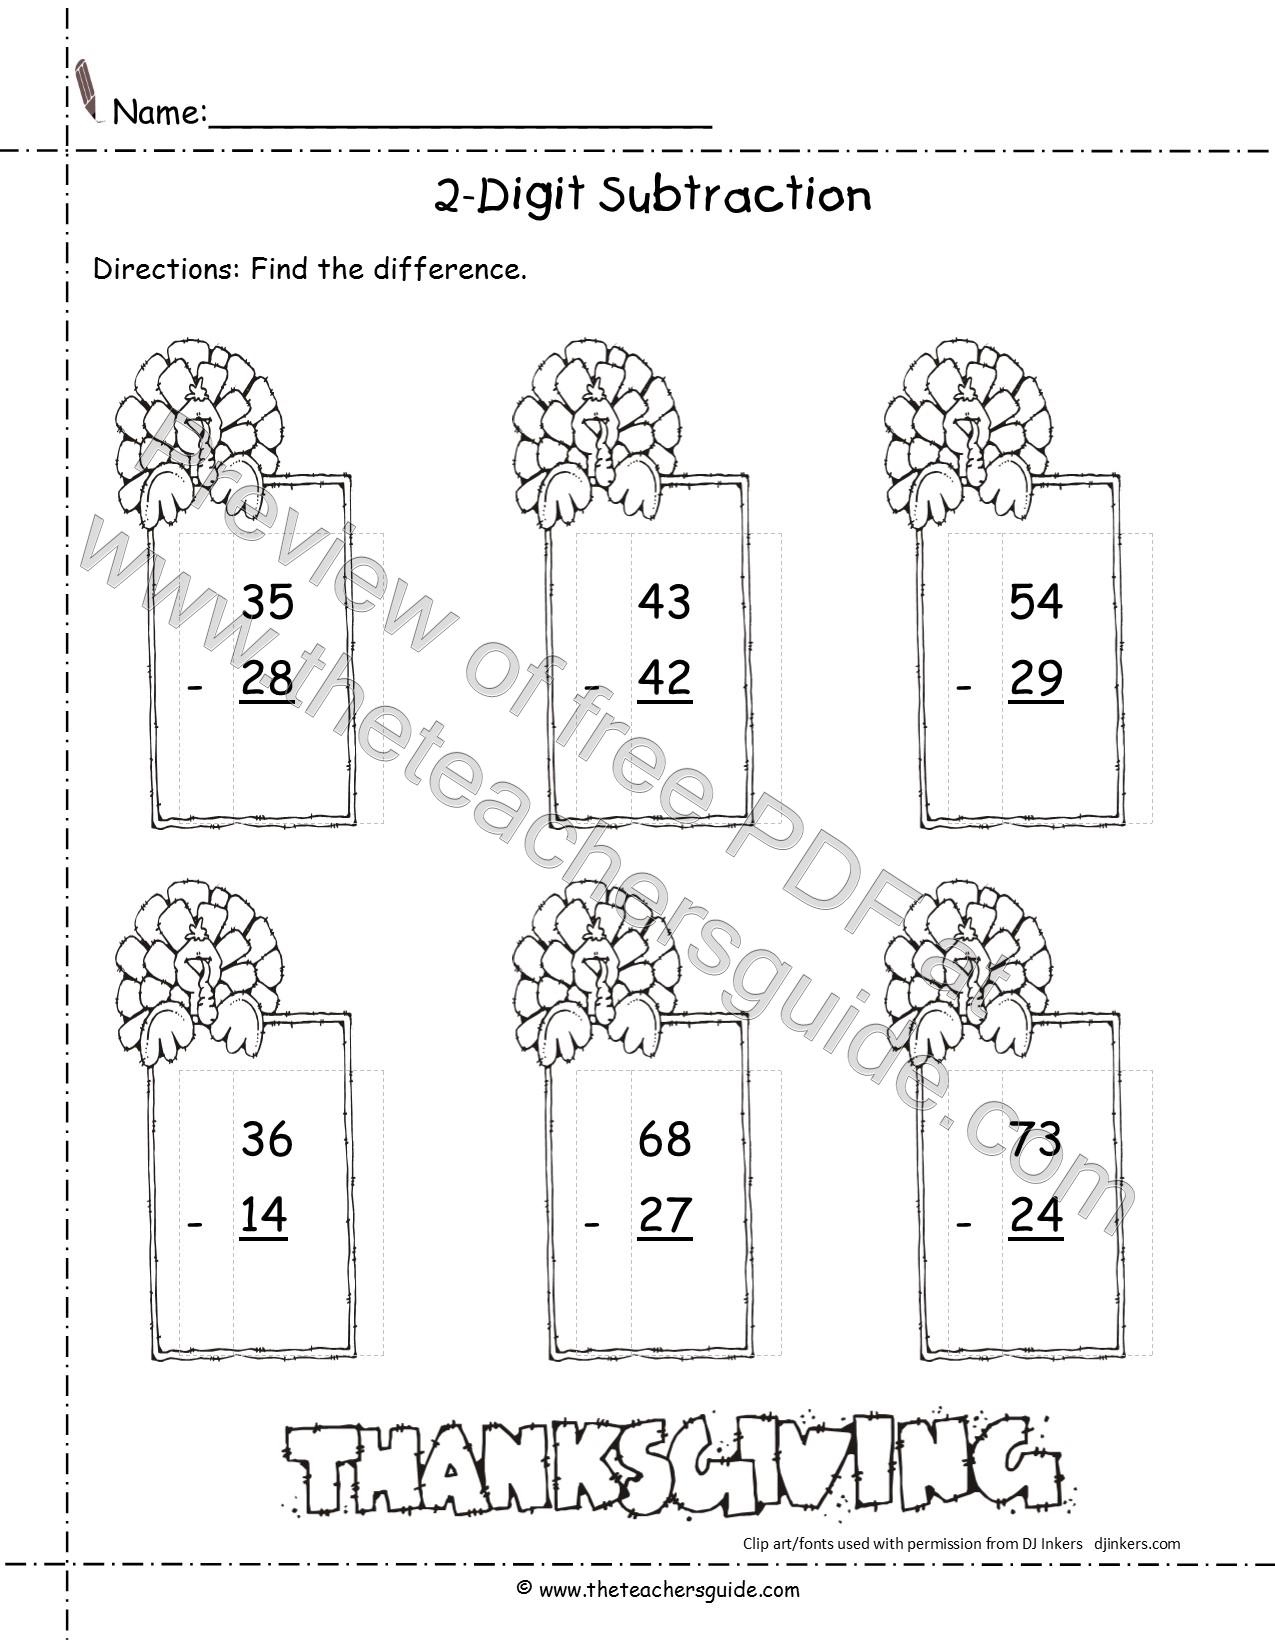 Thanksgiving Lesson Plans Themes Printouts Crafts